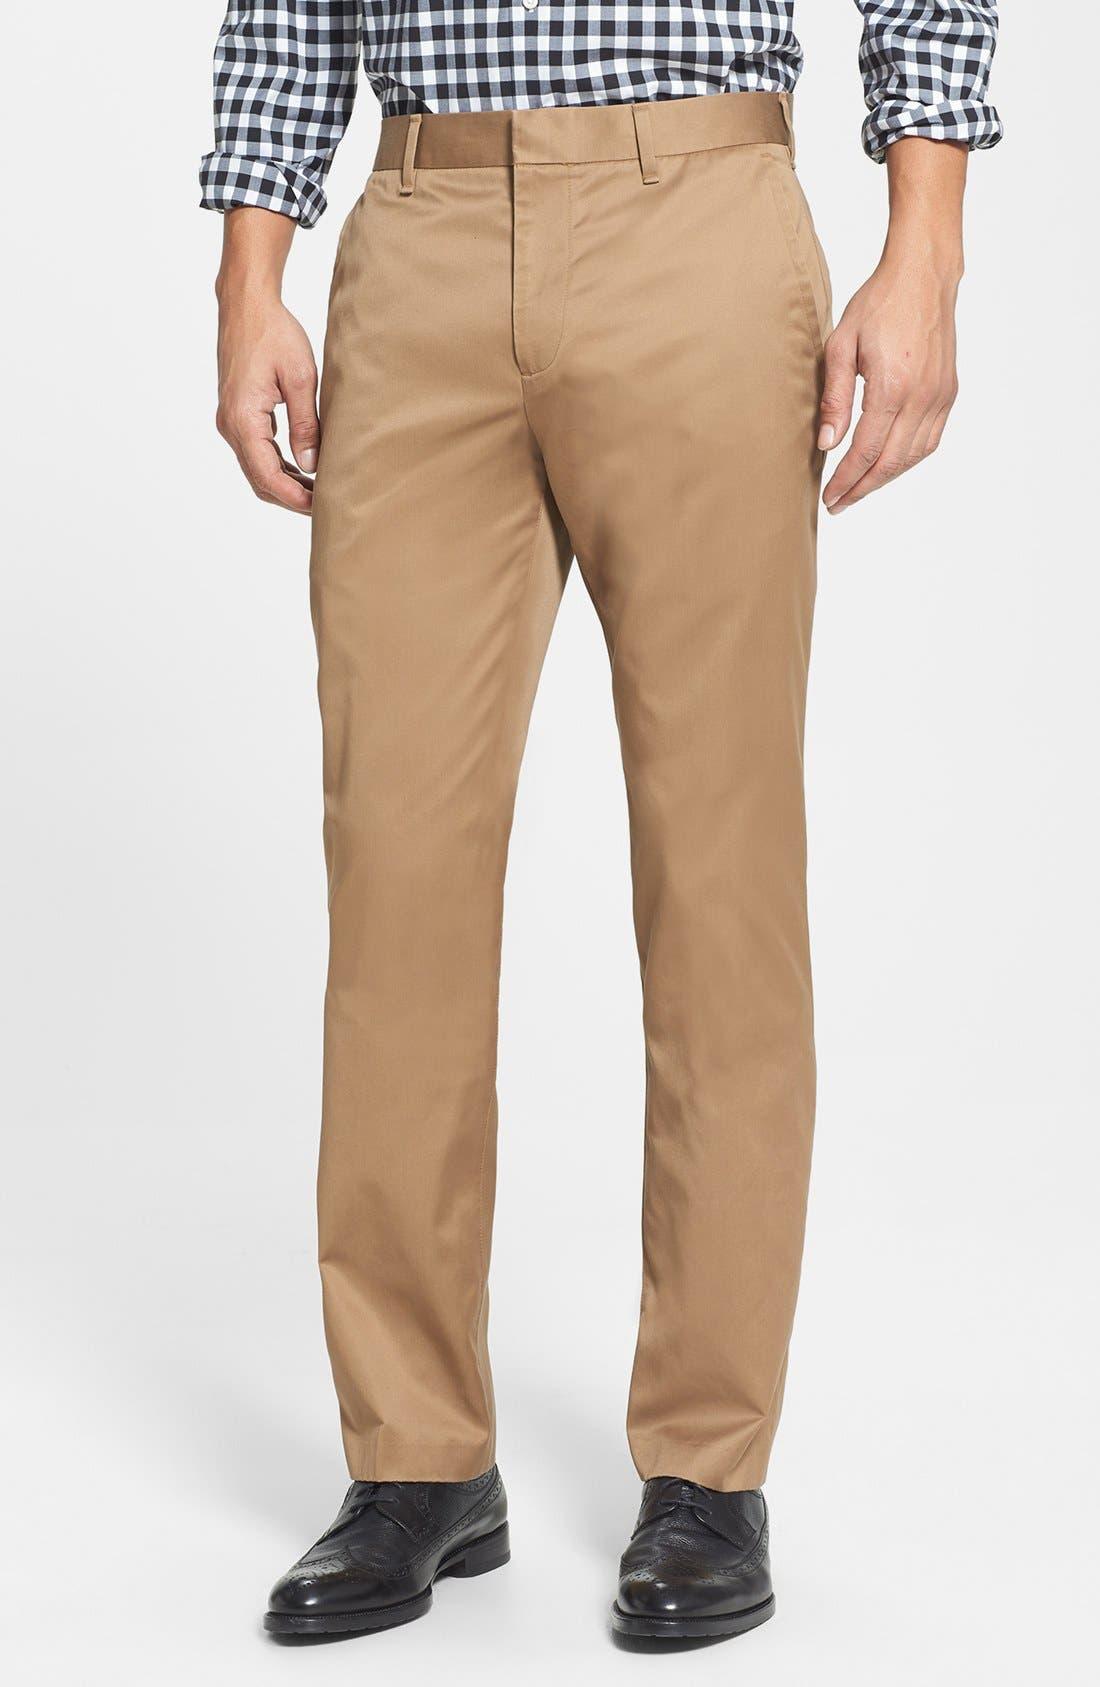 Beige Pants For Men HUYUZbi8